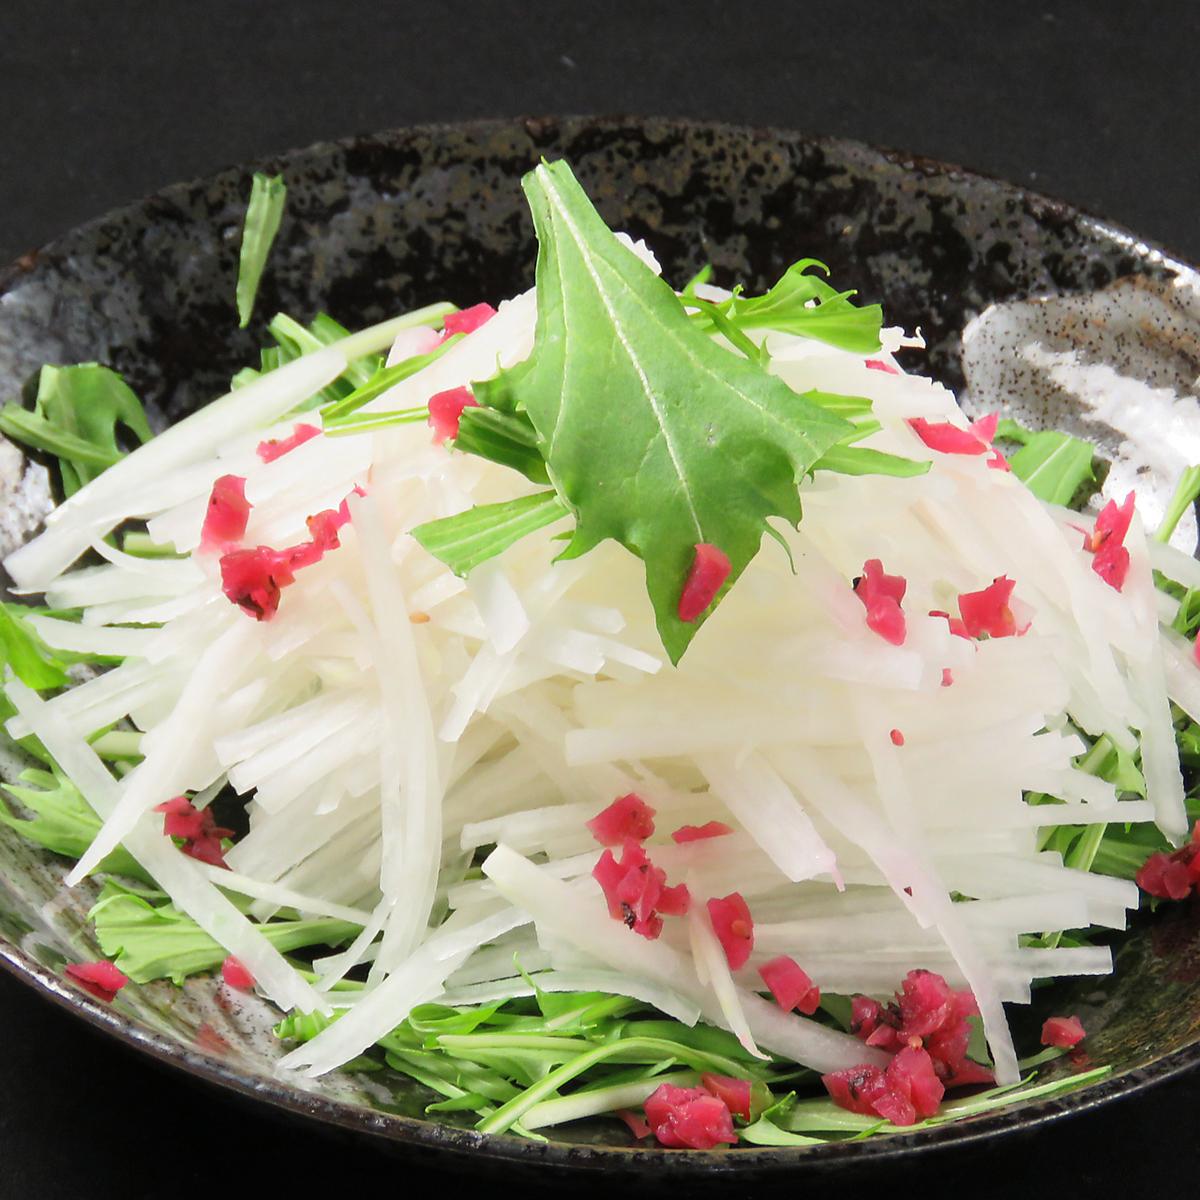 Crispy plum and radish freshly refreshing salad